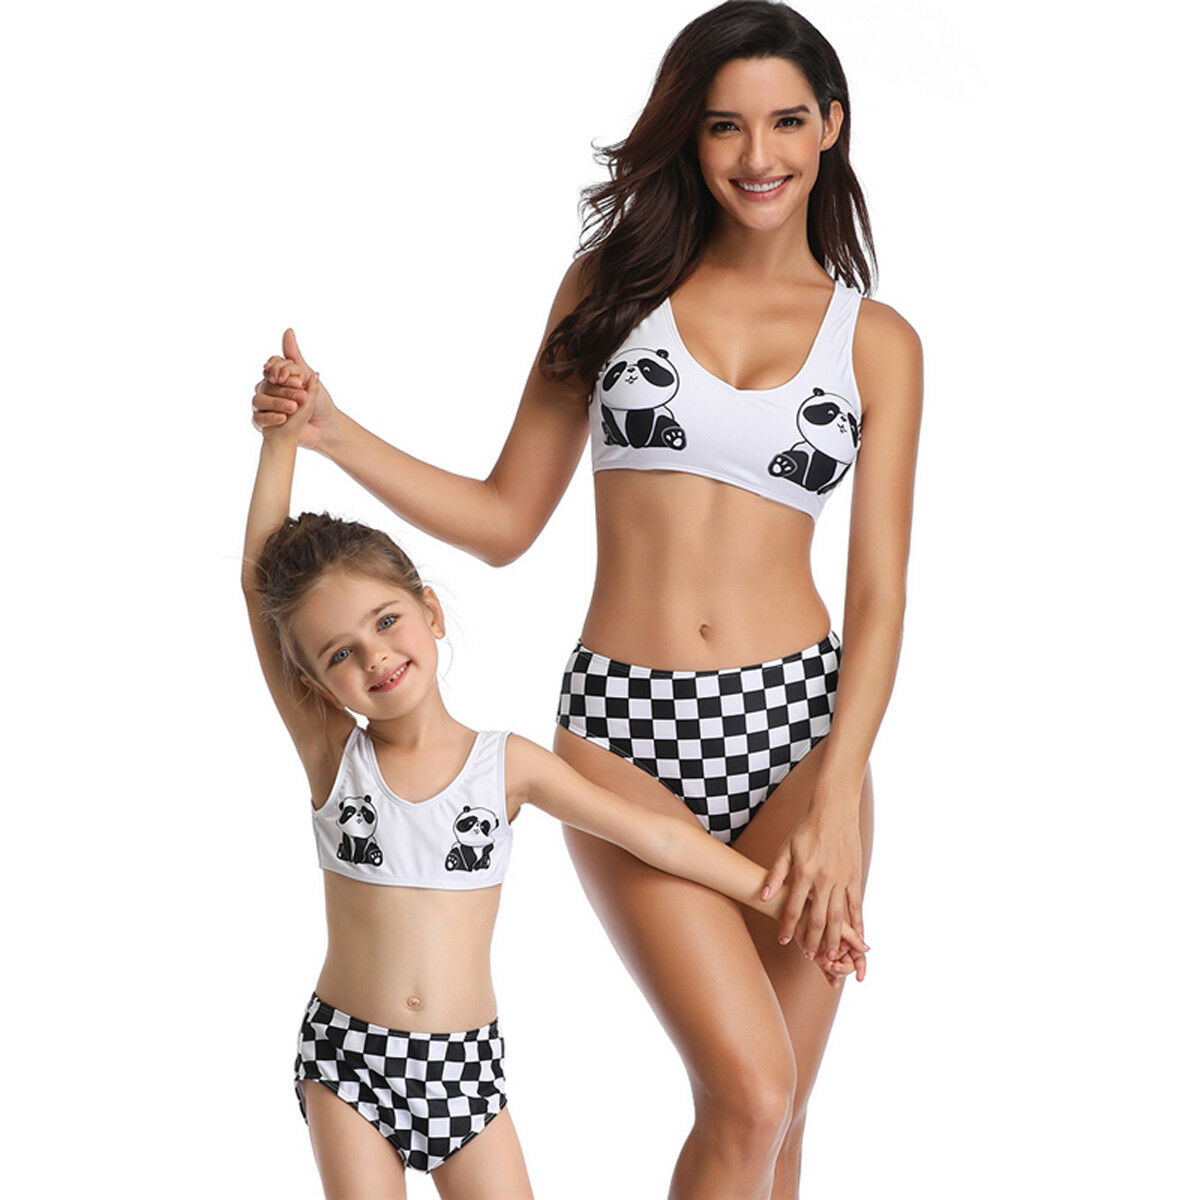 2019 Nieuwste Hot Familie Bijpassende Badmode Moeder Dochter Leuke Panda Gedrukt Plaid Bikini Badpak Beachwear Monokini